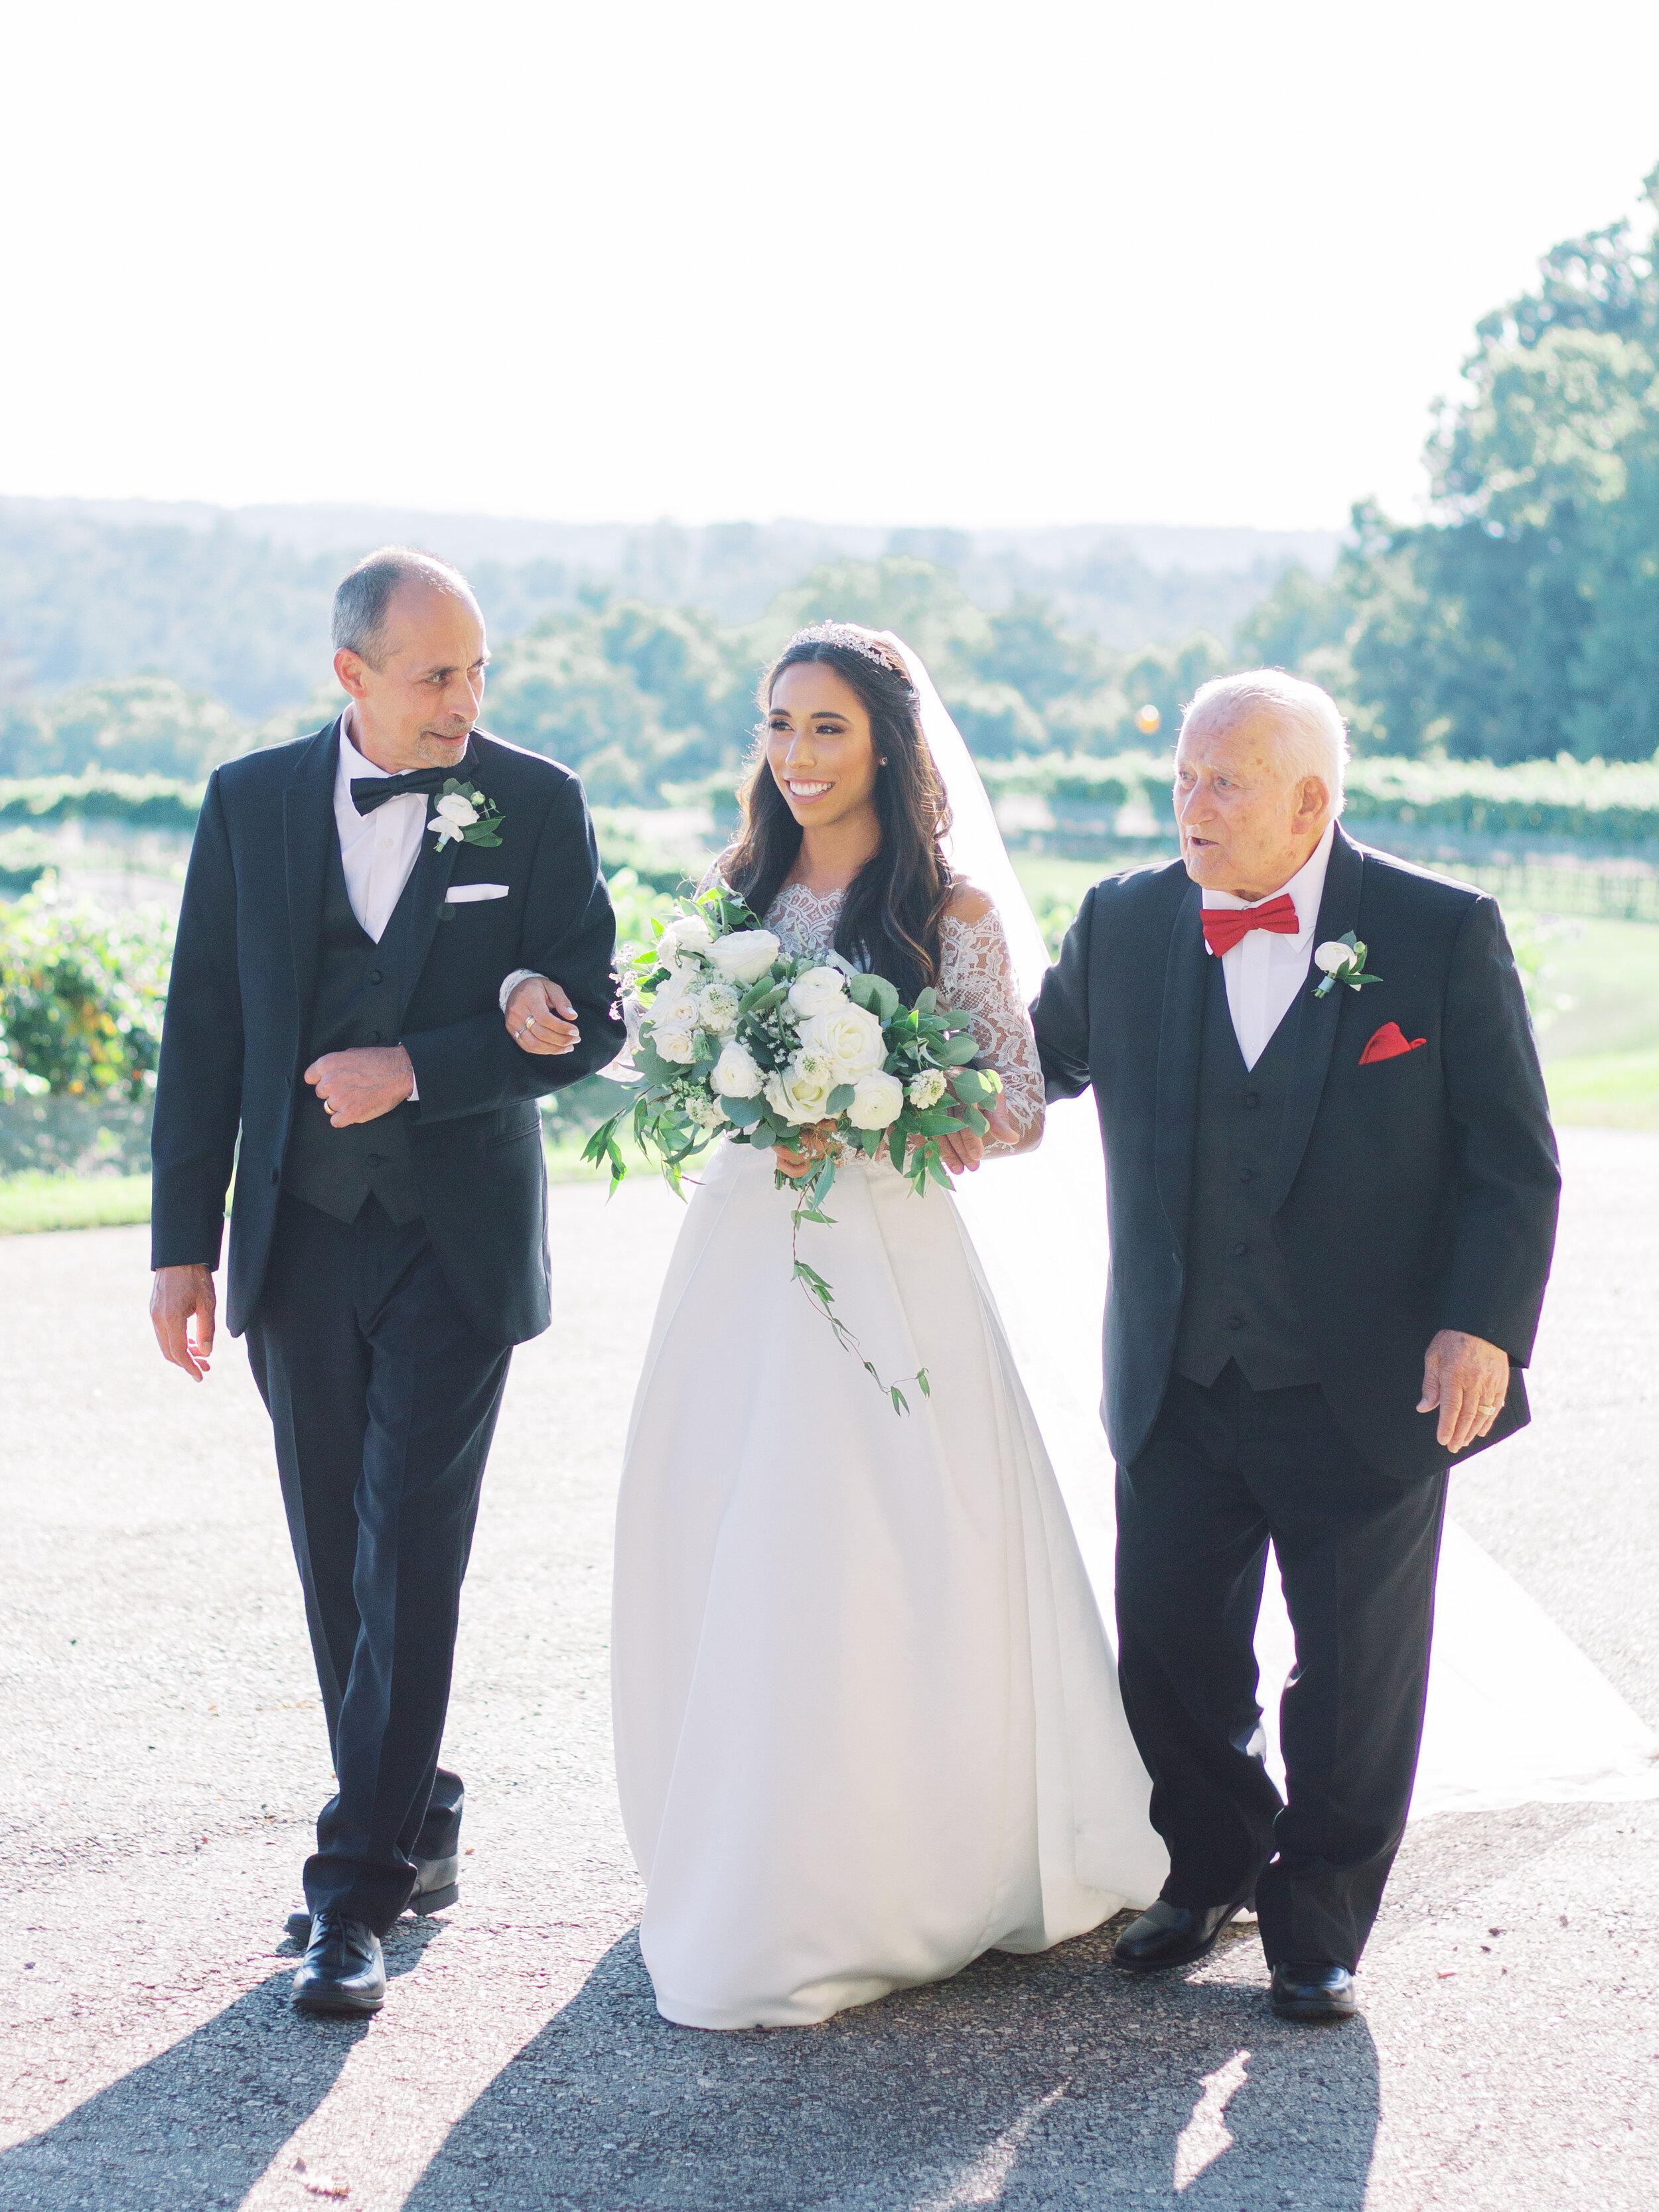 montaluce-winery-wedding-photography-dahlonega-hannah-forsberg-atlanta-film-wedding-photographer14.JPG